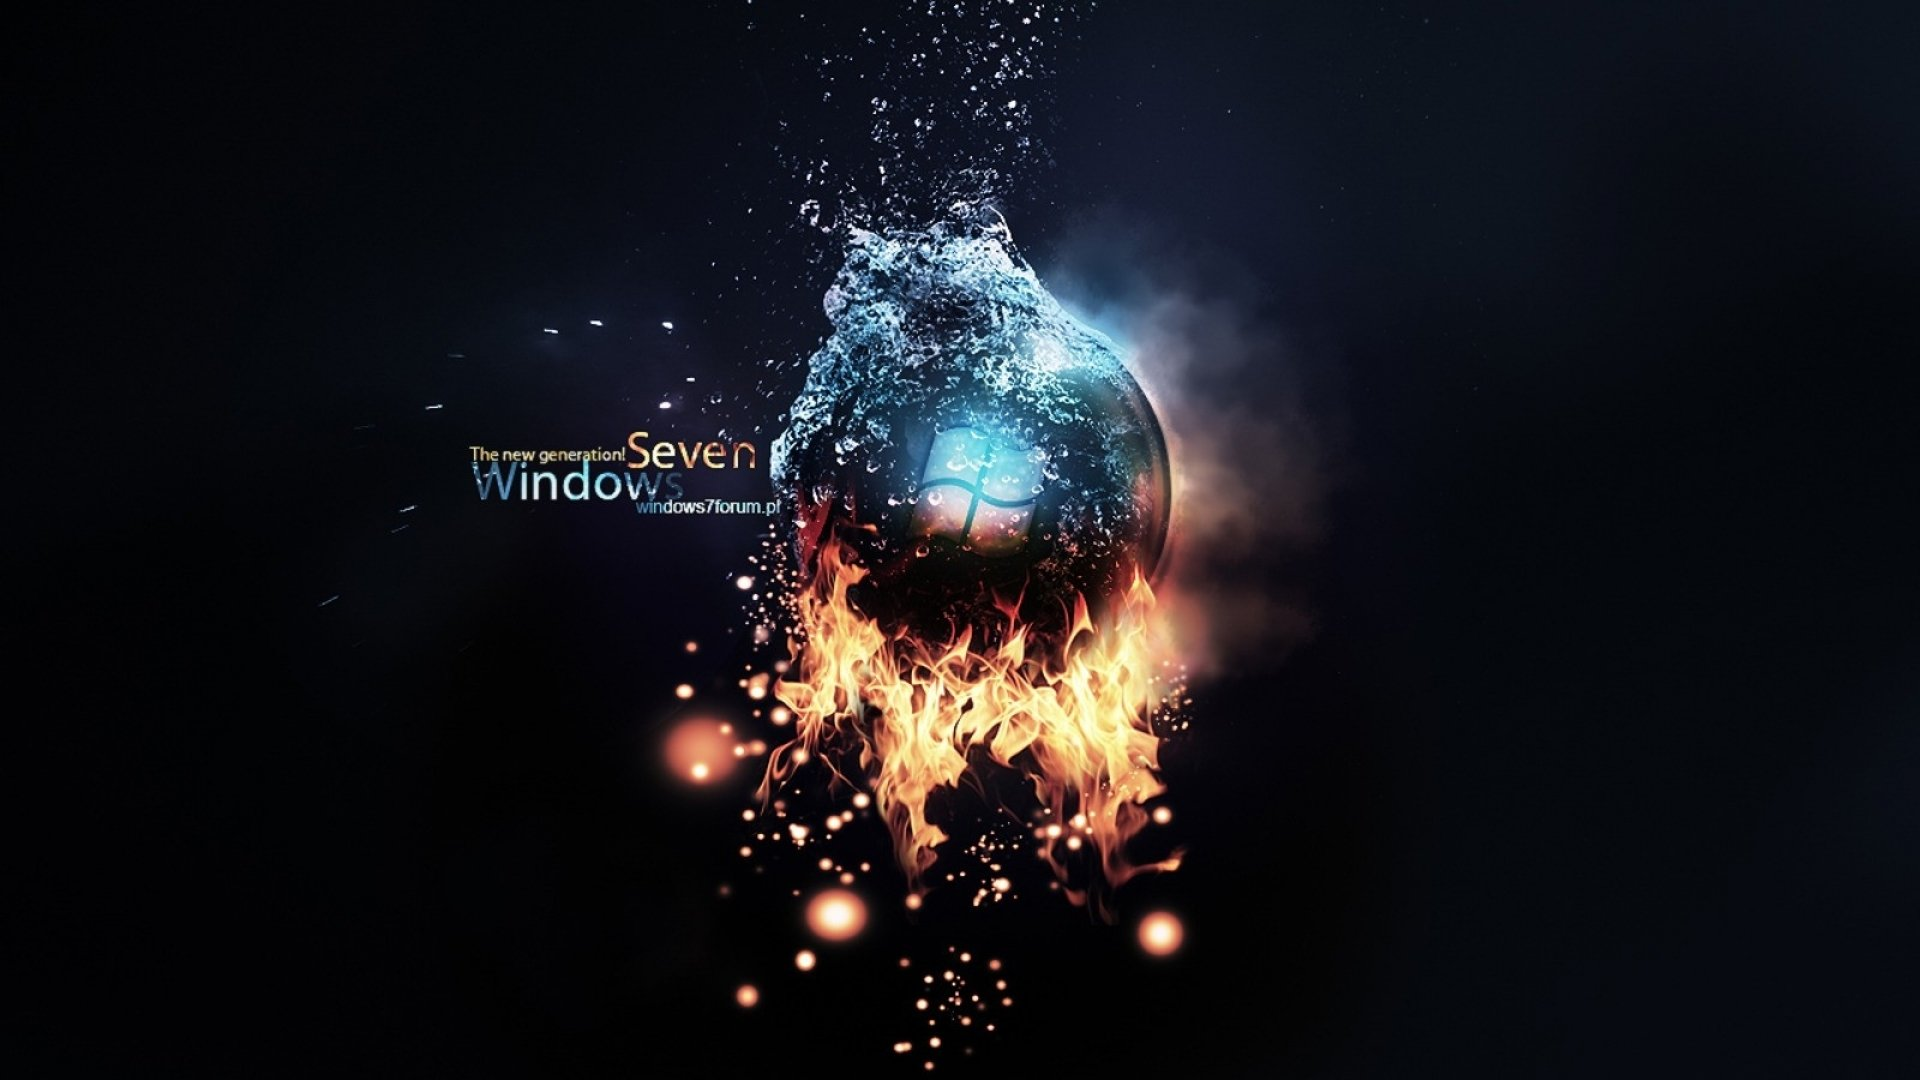 Windows 7 Wallpapers 1920x1080 Full Hd 1080p Desktop Backgrounds